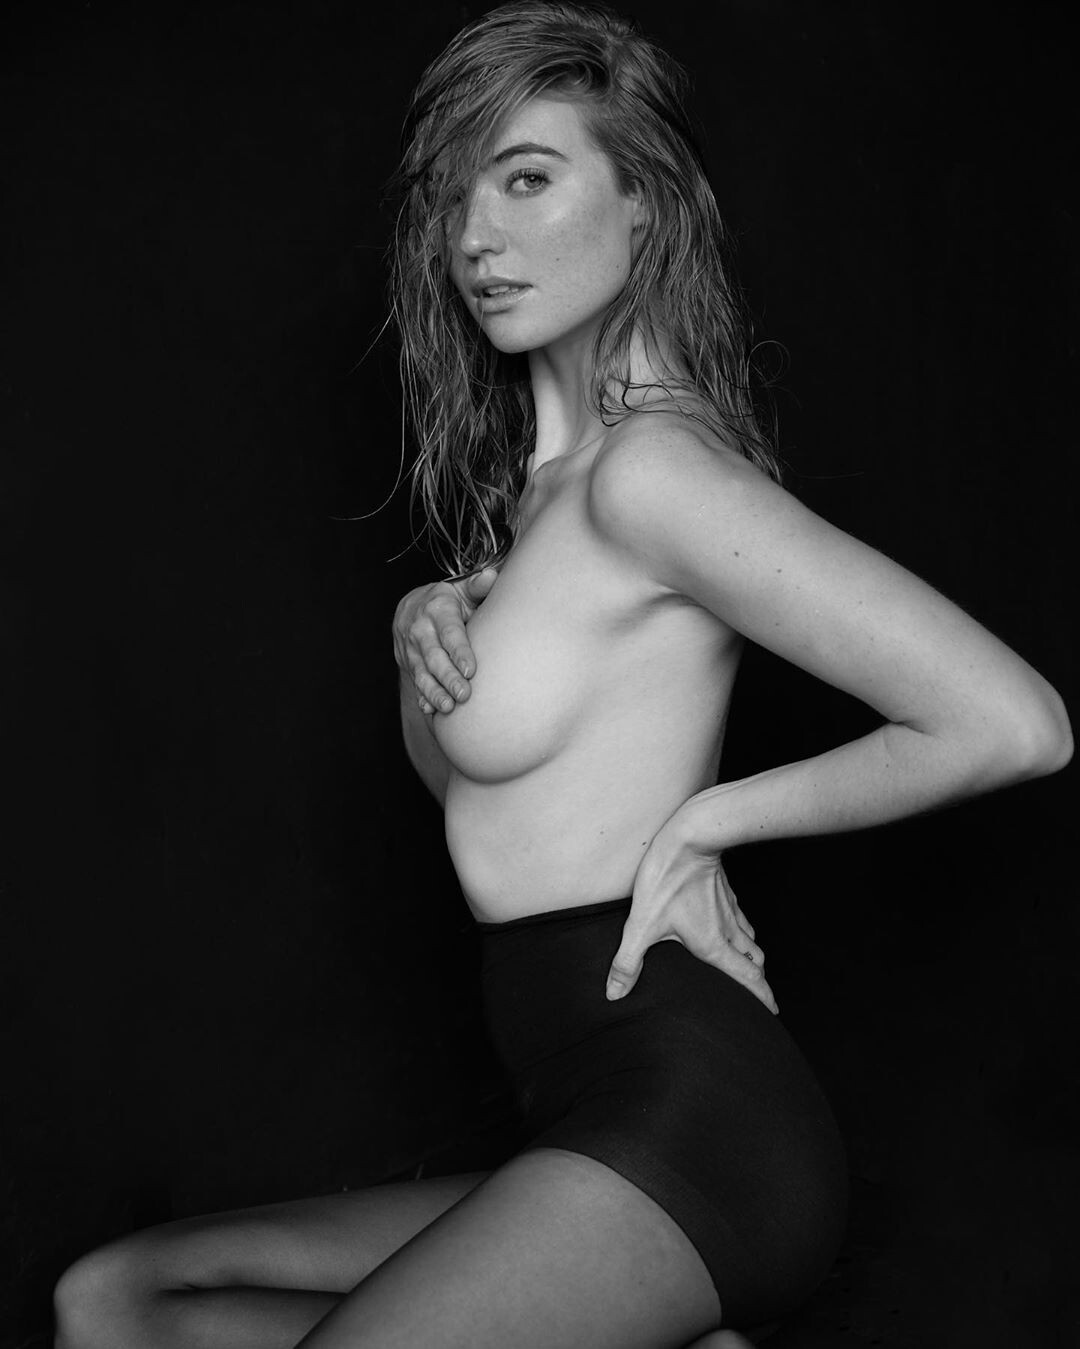 Palonia Olson by Jared Kocka